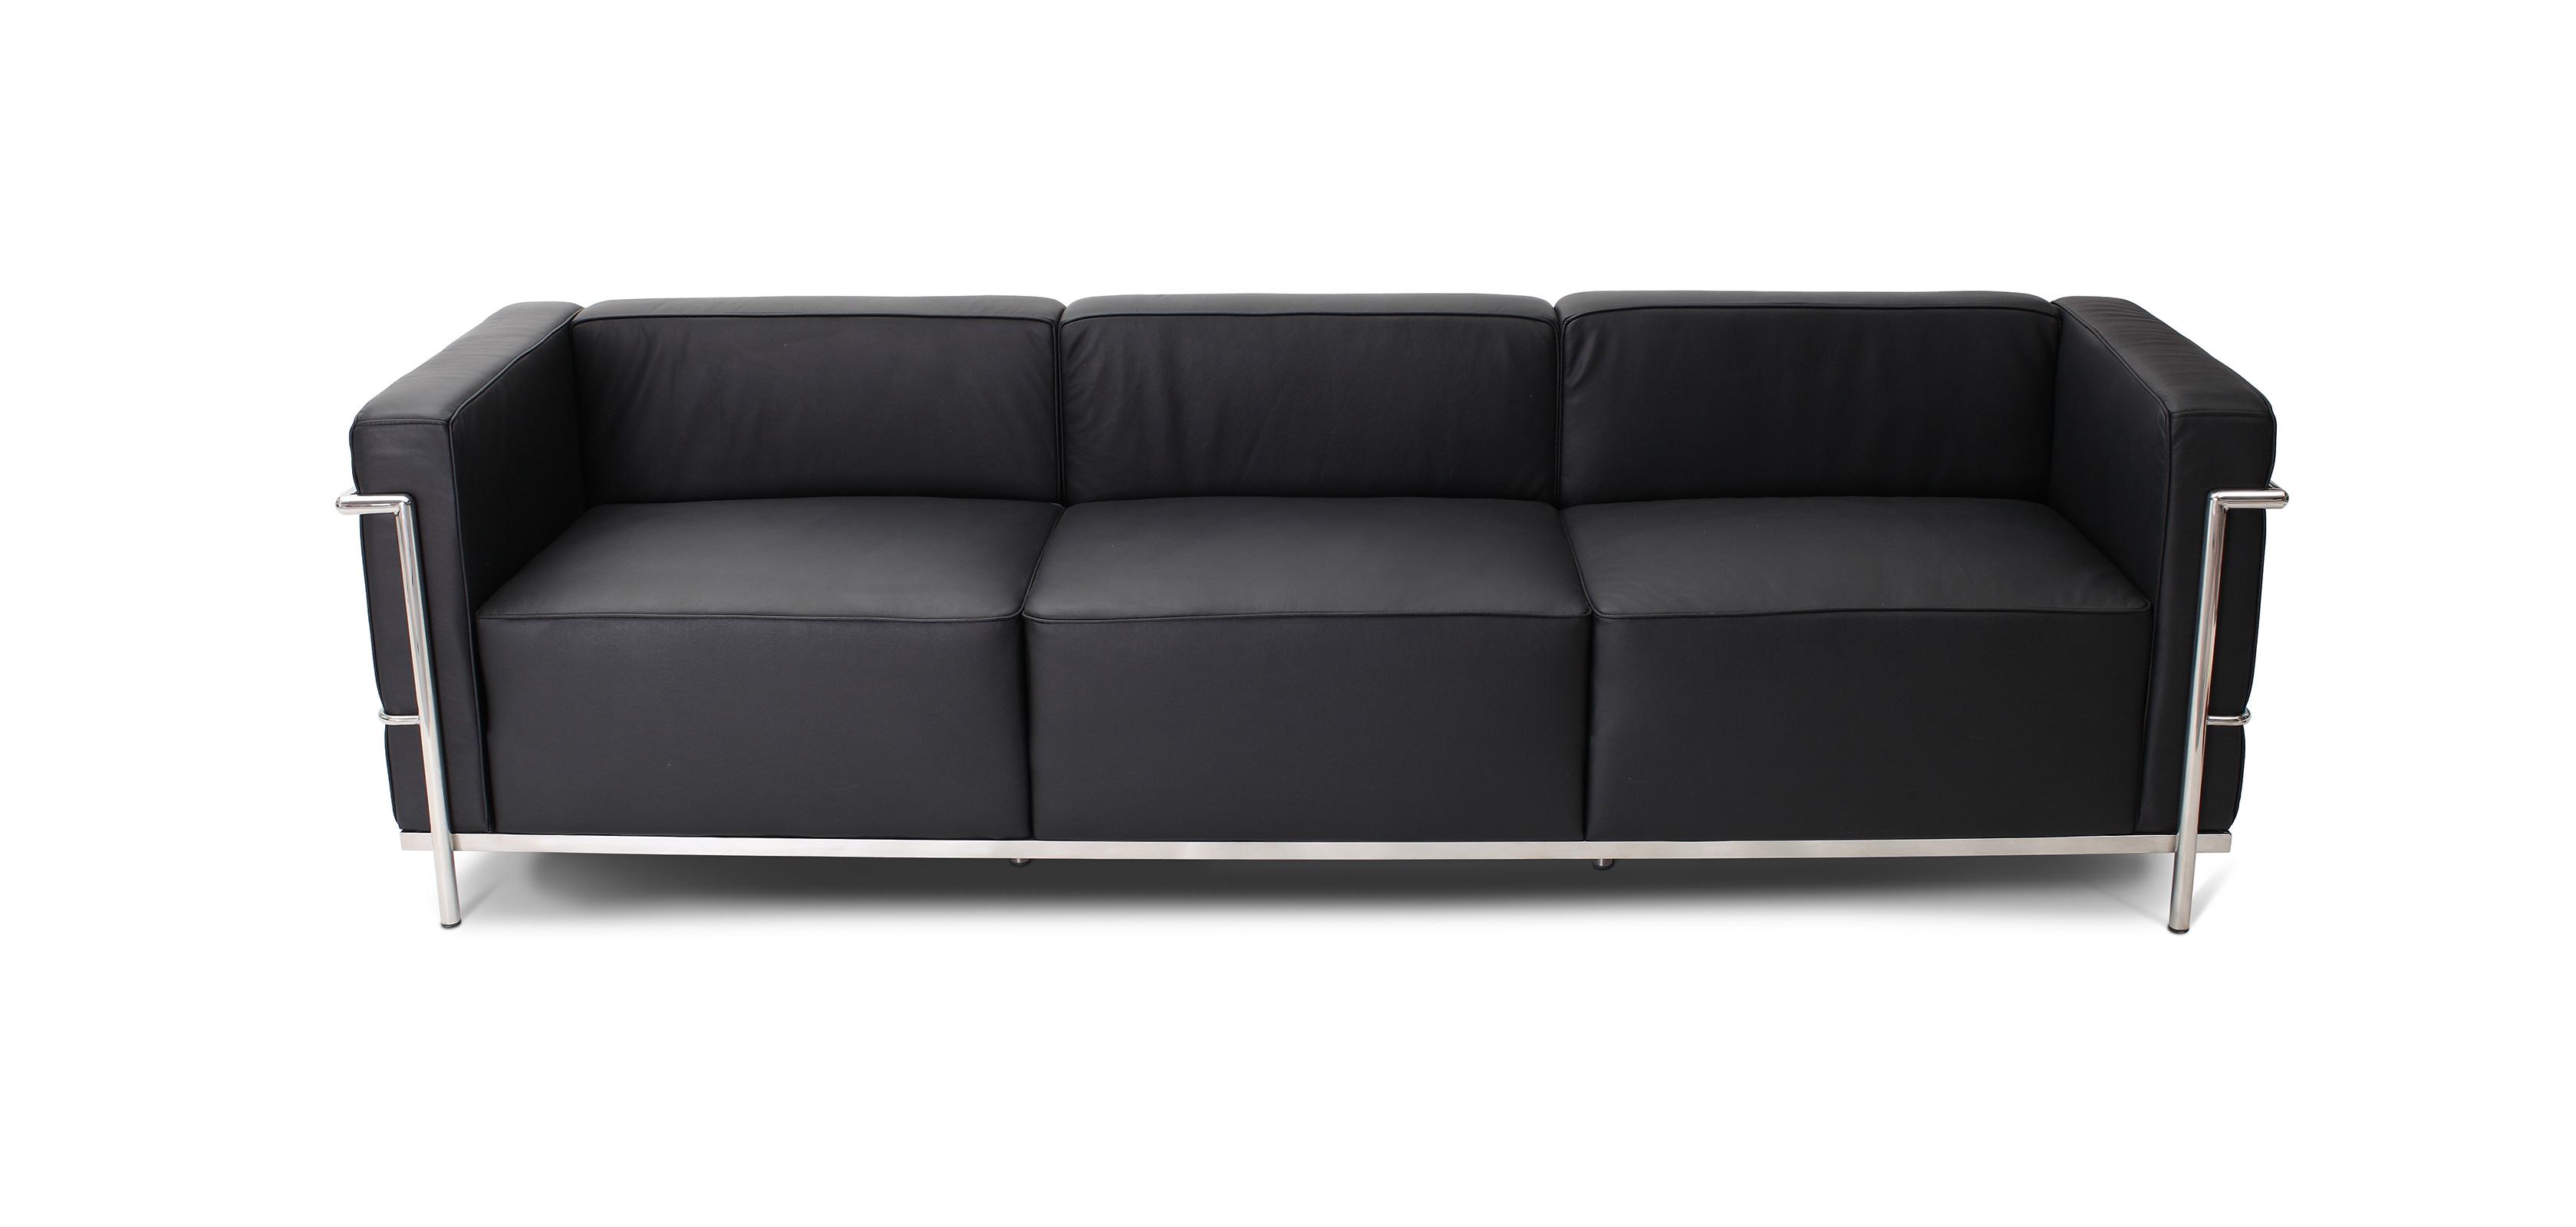 Canapé design Kart3 Simili Cuir